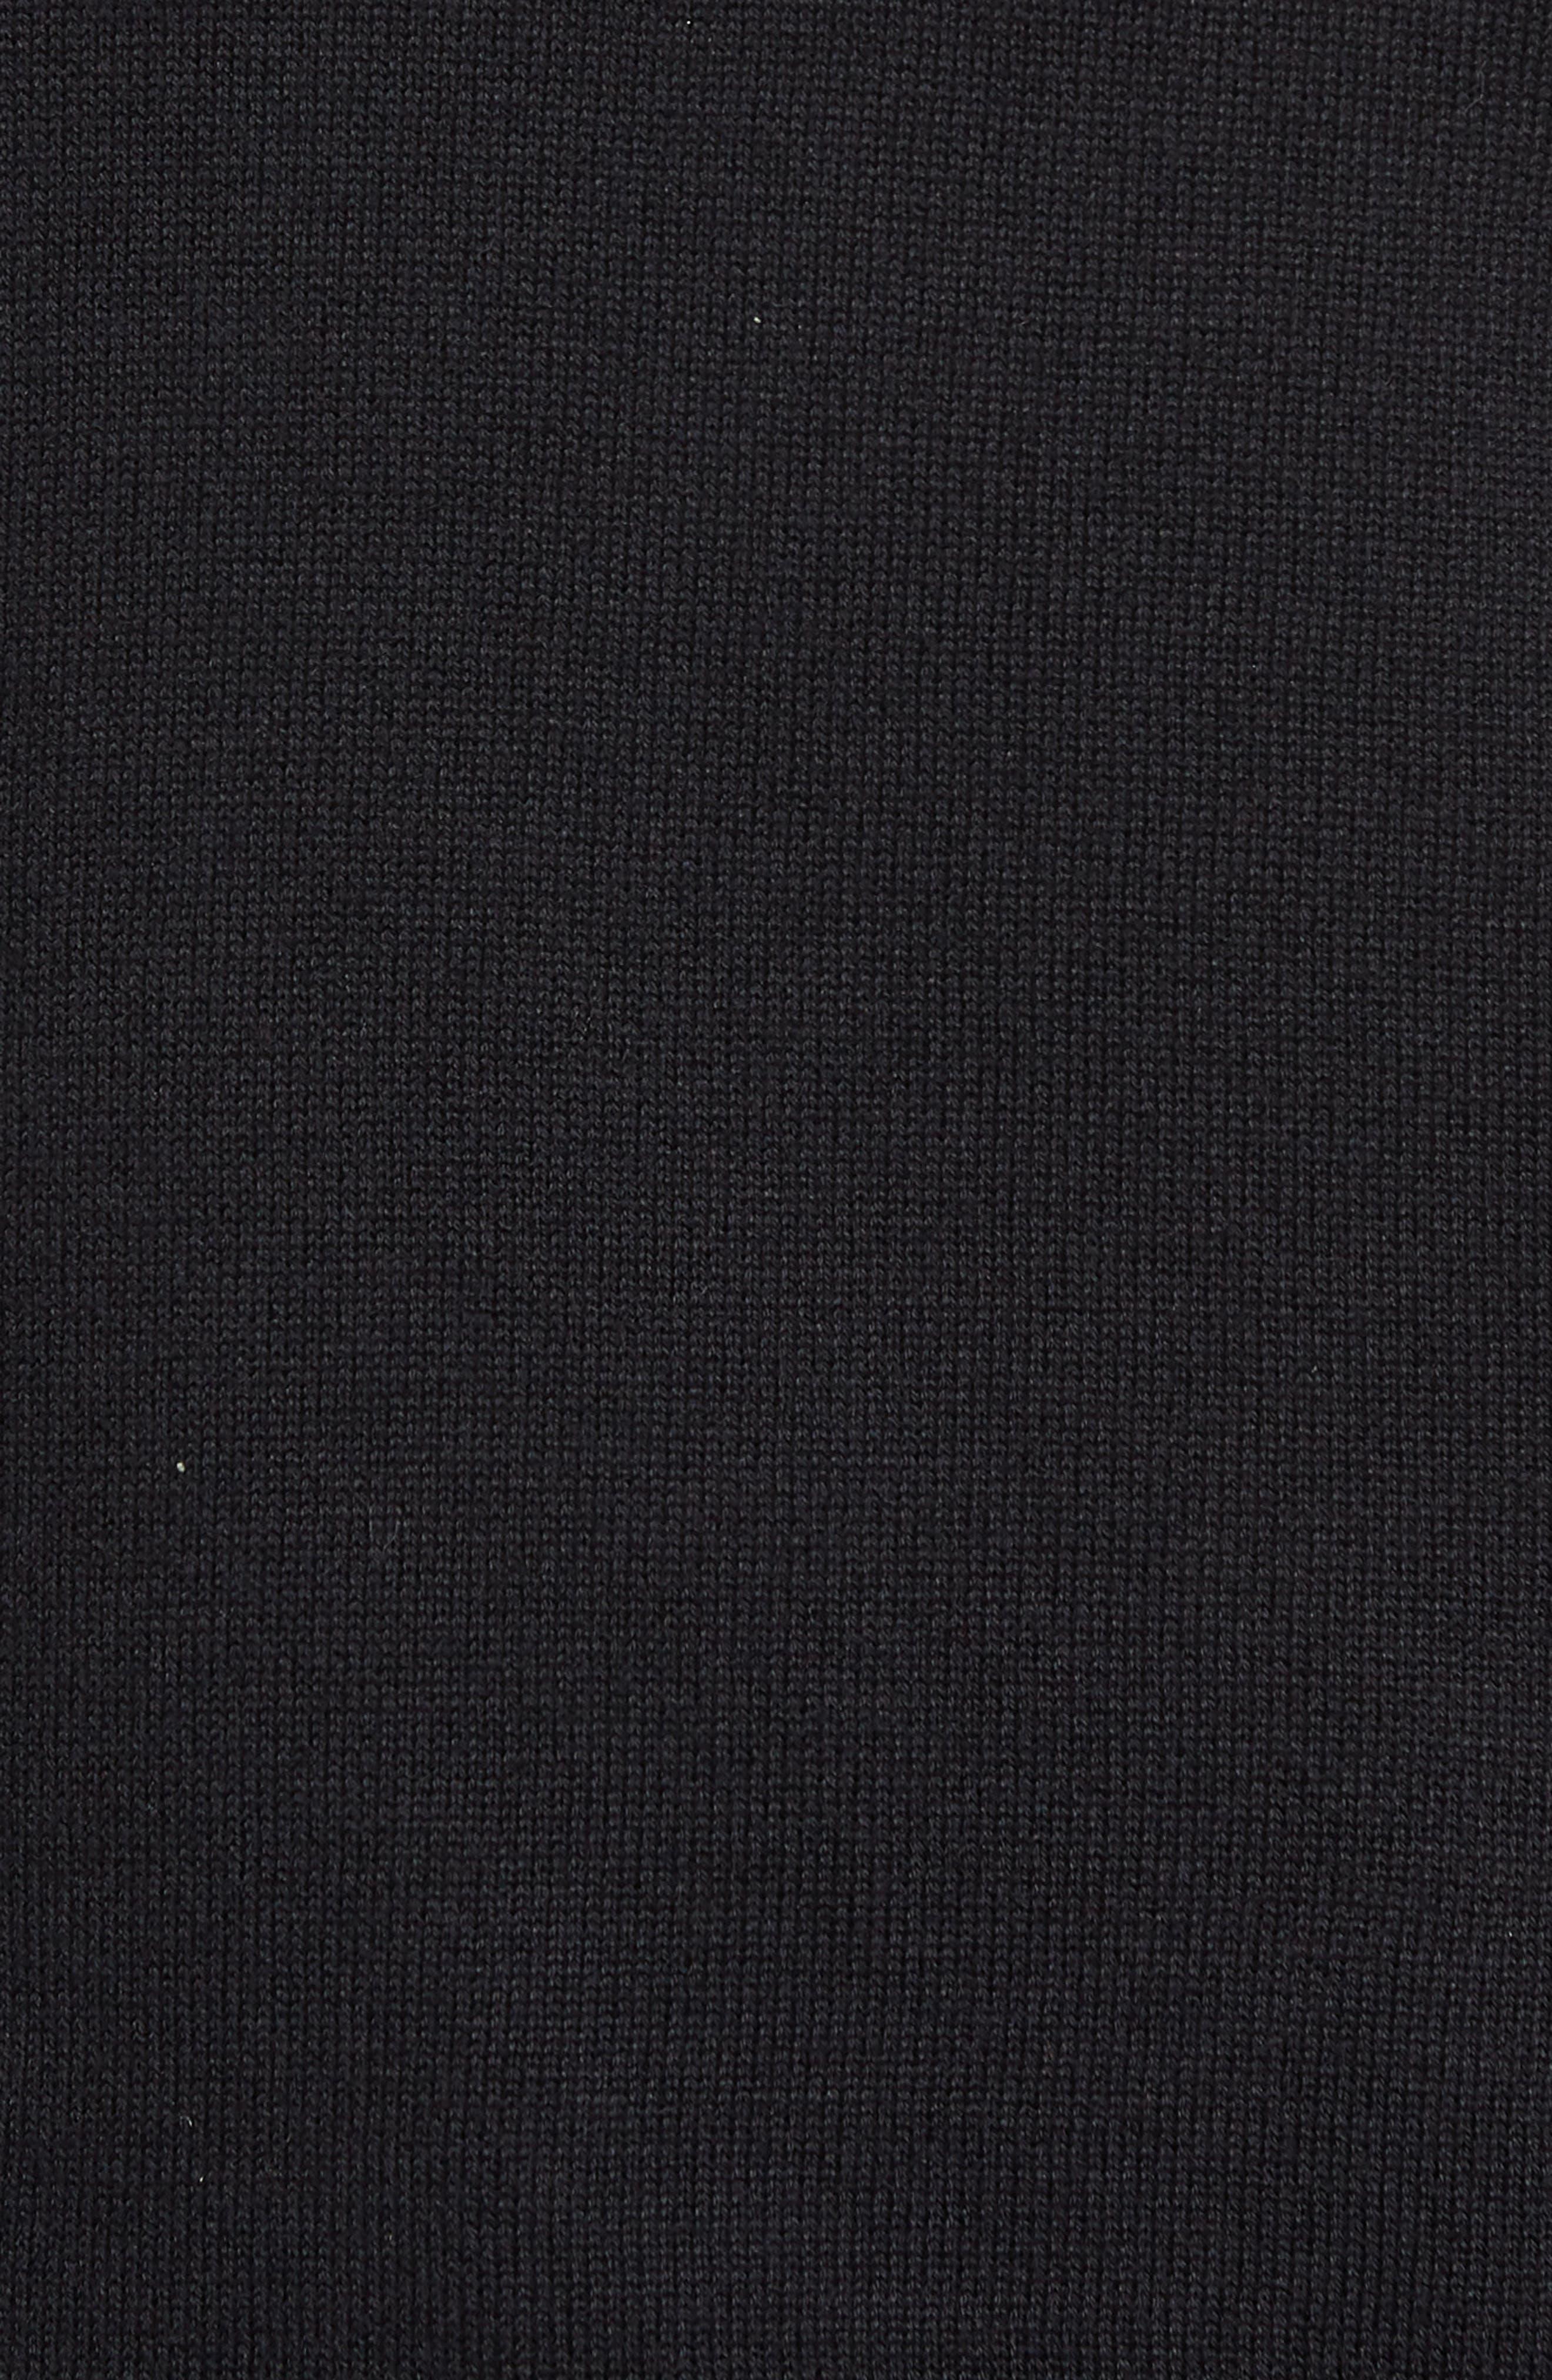 Bell Sleeve Choker Neck Sweater,                             Alternate thumbnail 21, color,